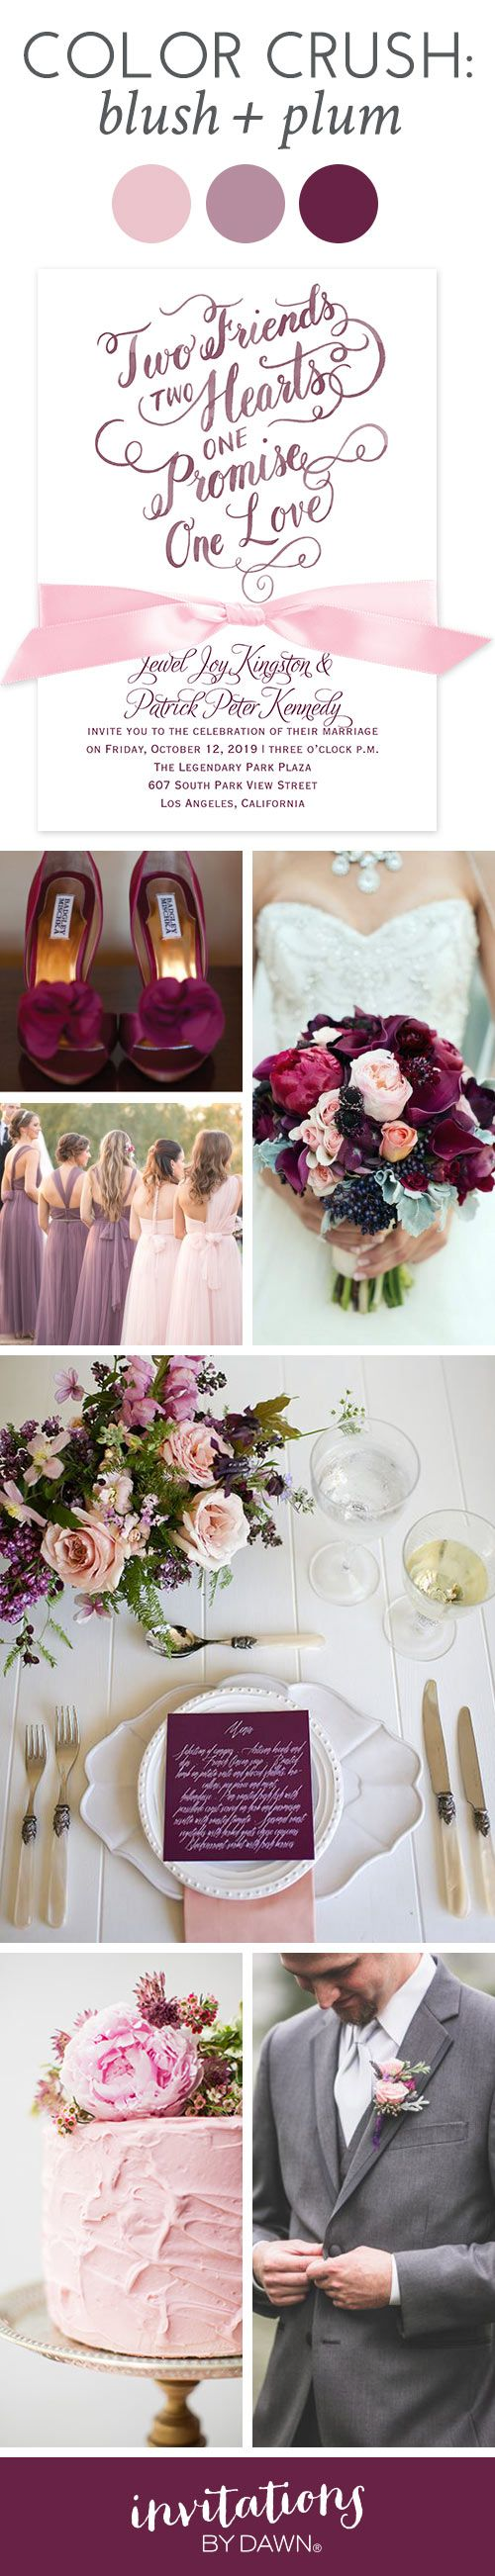 purple white silver wedding invitations%0A Color Crush  Blush and Plum